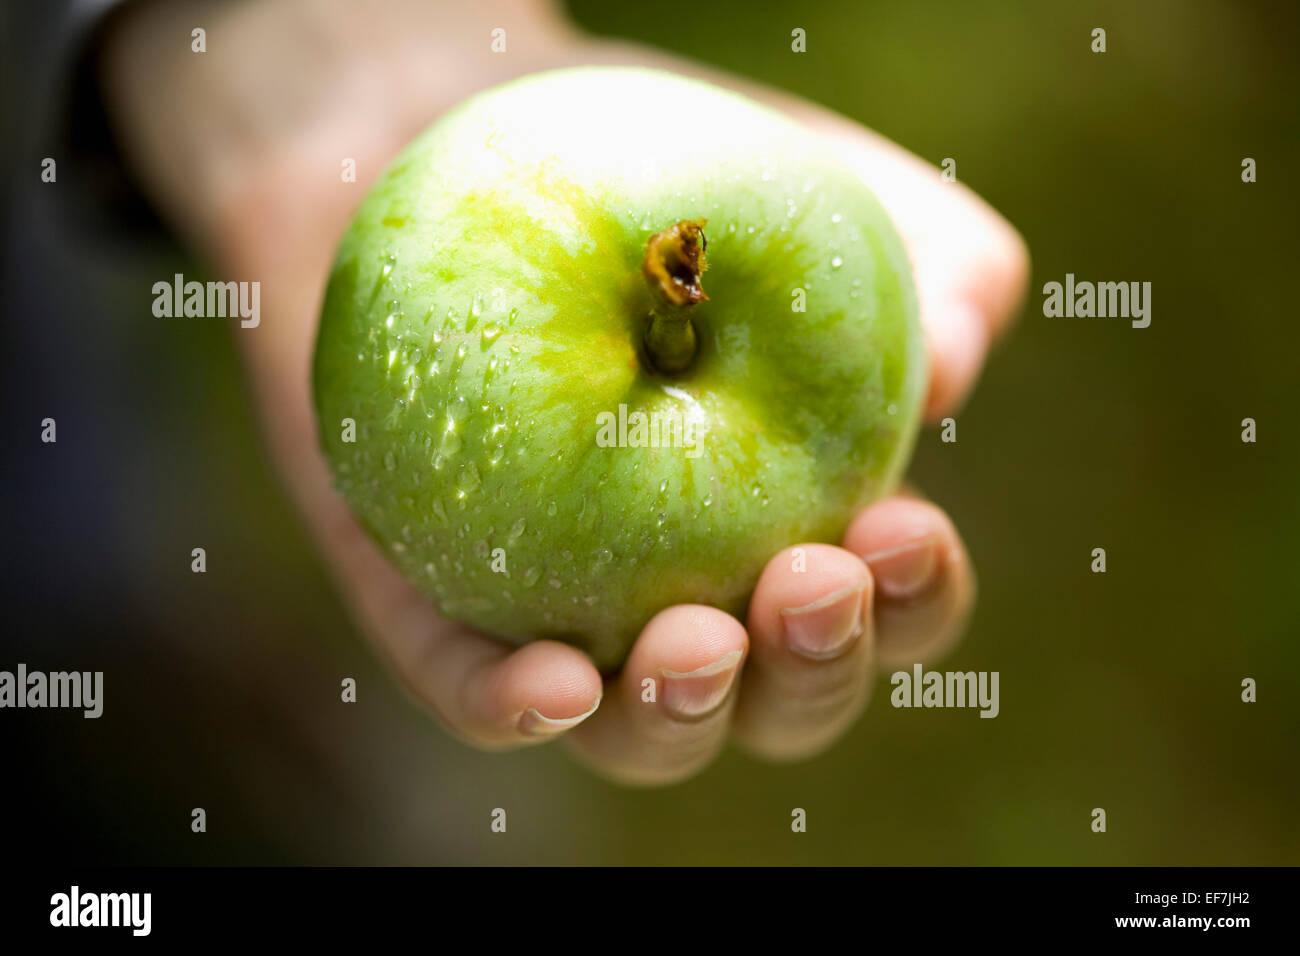 Hand holding fresh green apple - Stock Image